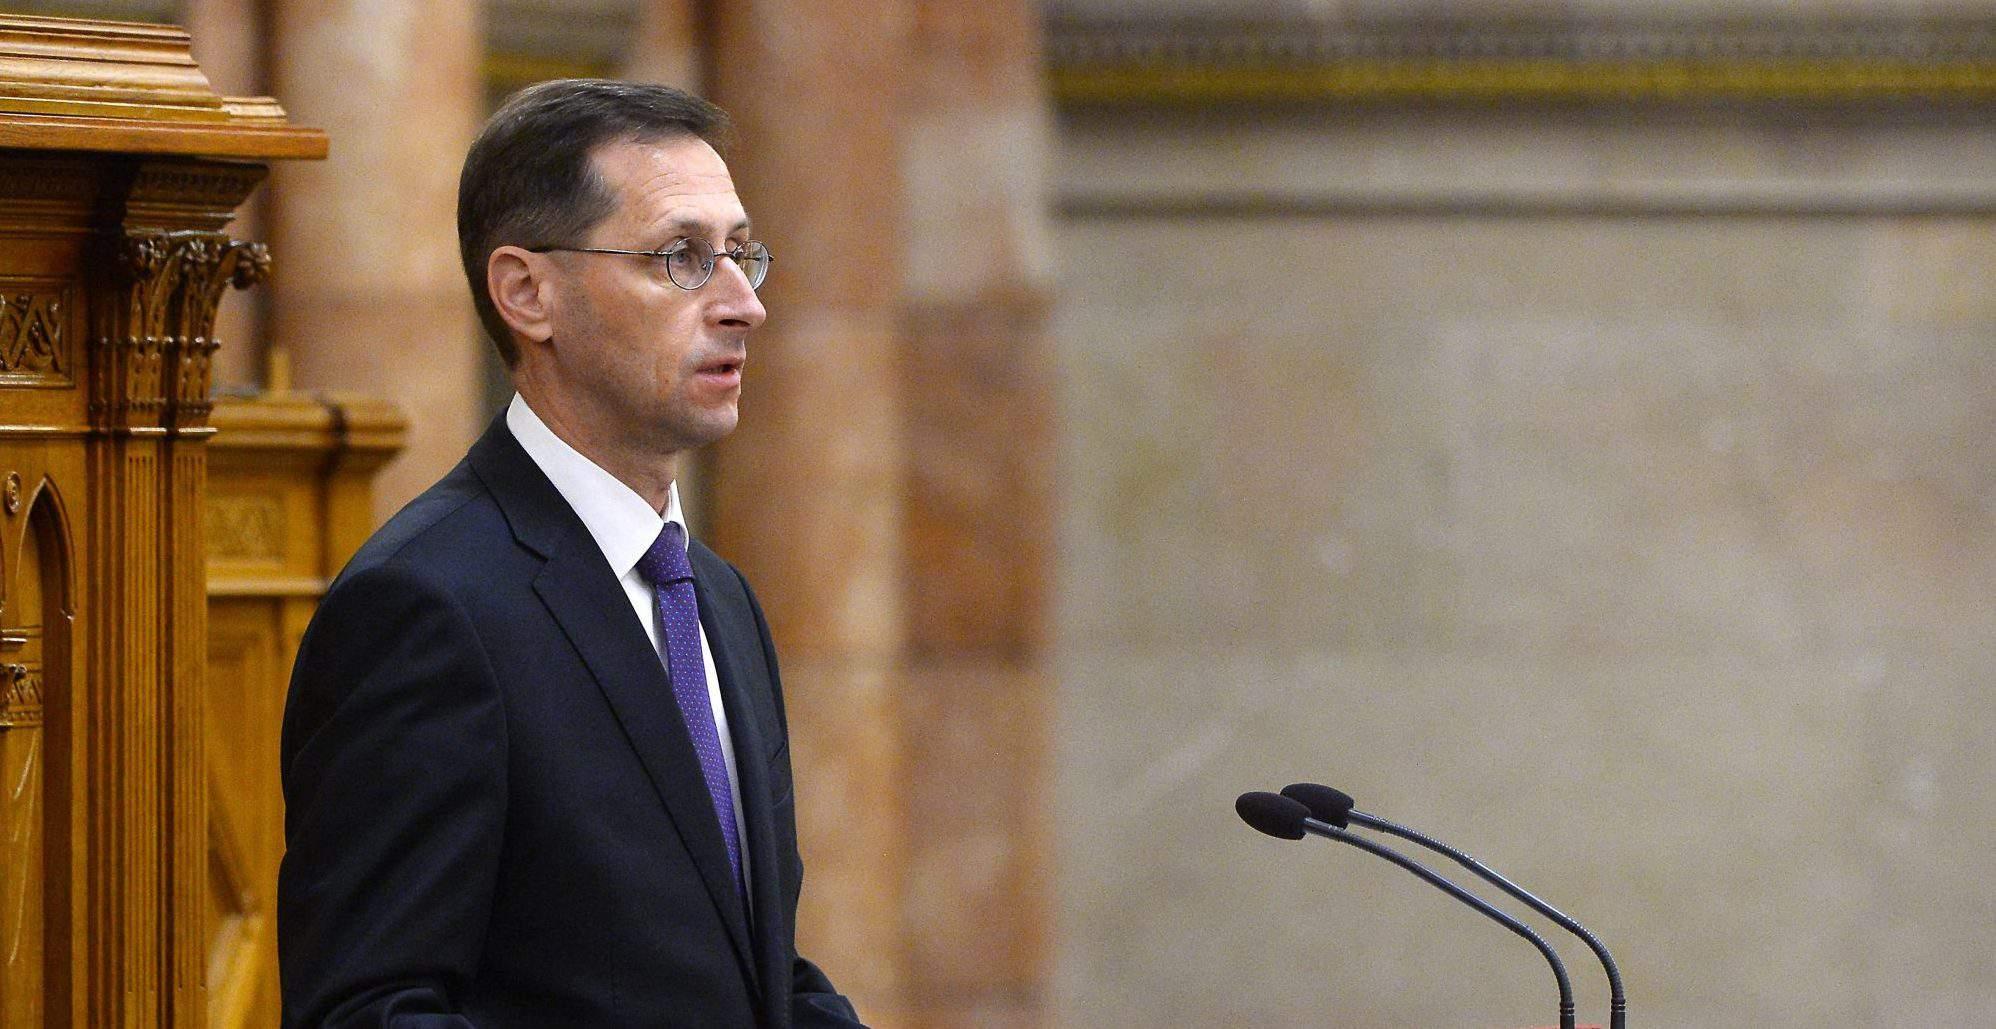 economy minister Hungary